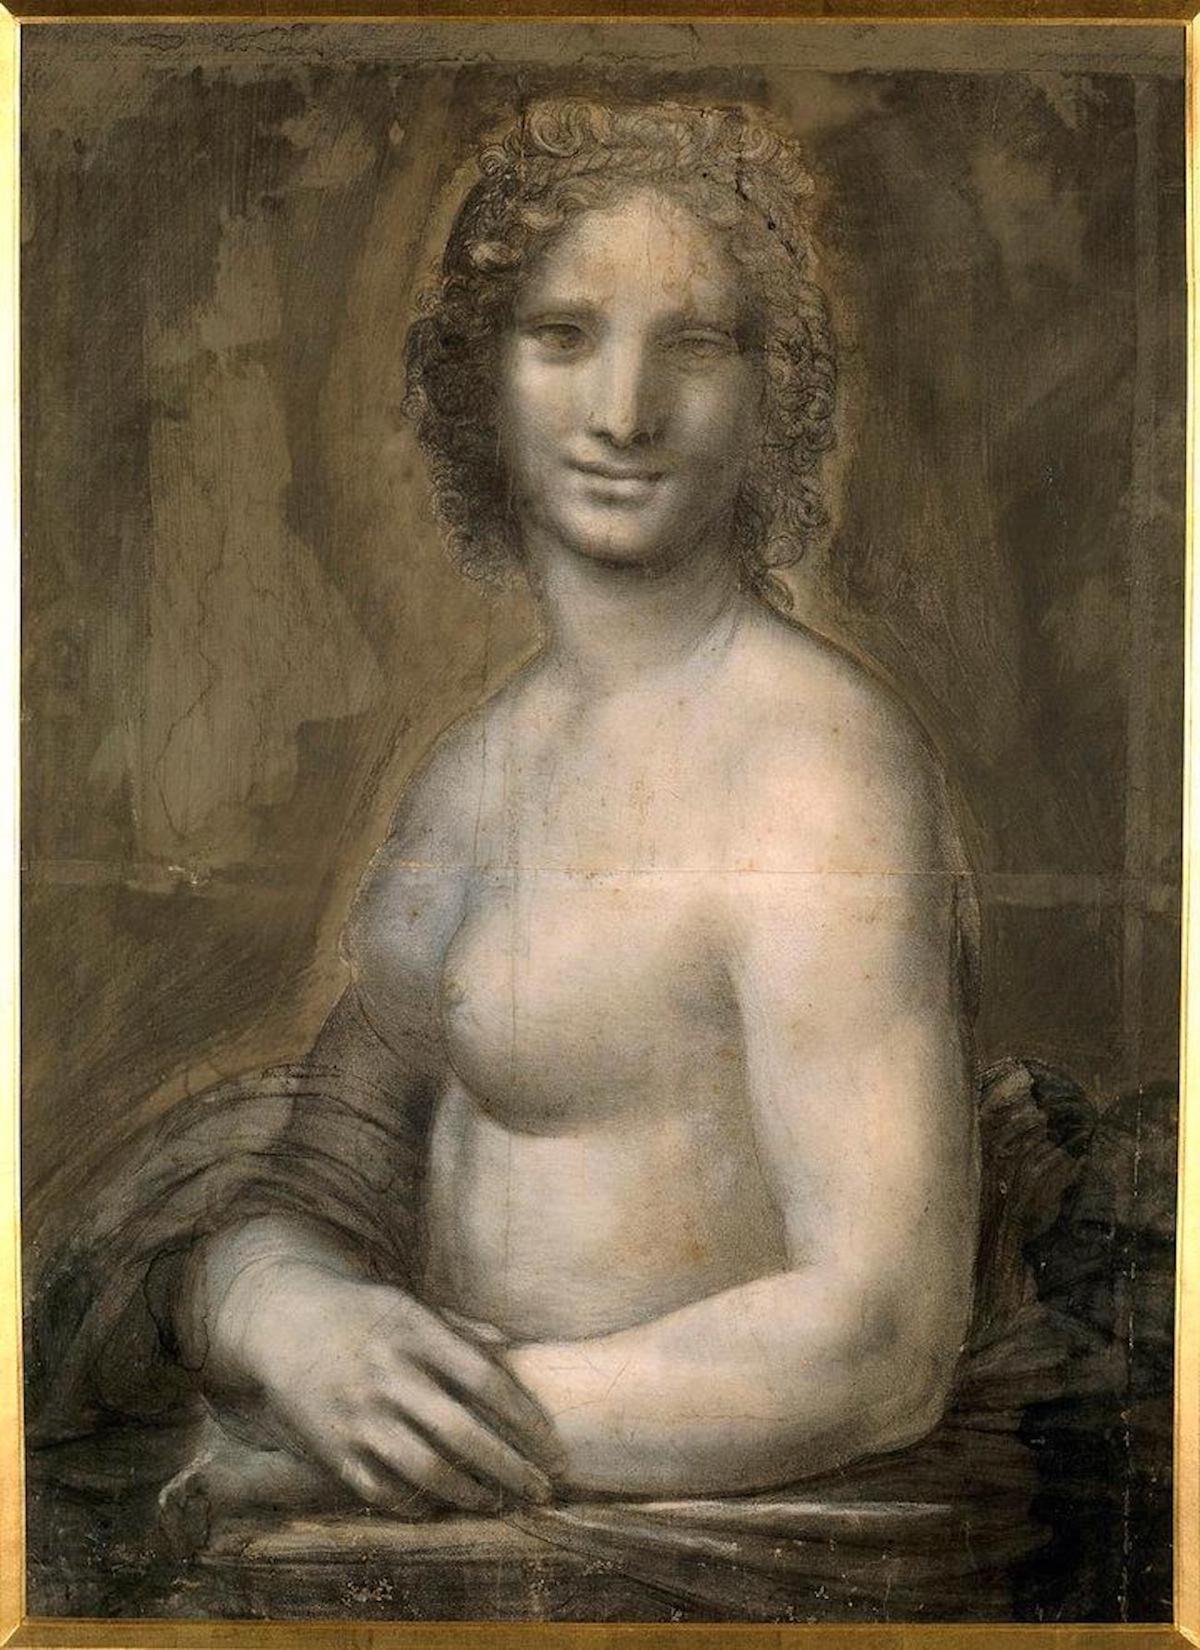 Studio of Leonardo da Vinci, Monna Vanna, c. 1503. Image by Emiliano M. Aguilera, via Wikimedia Commons.